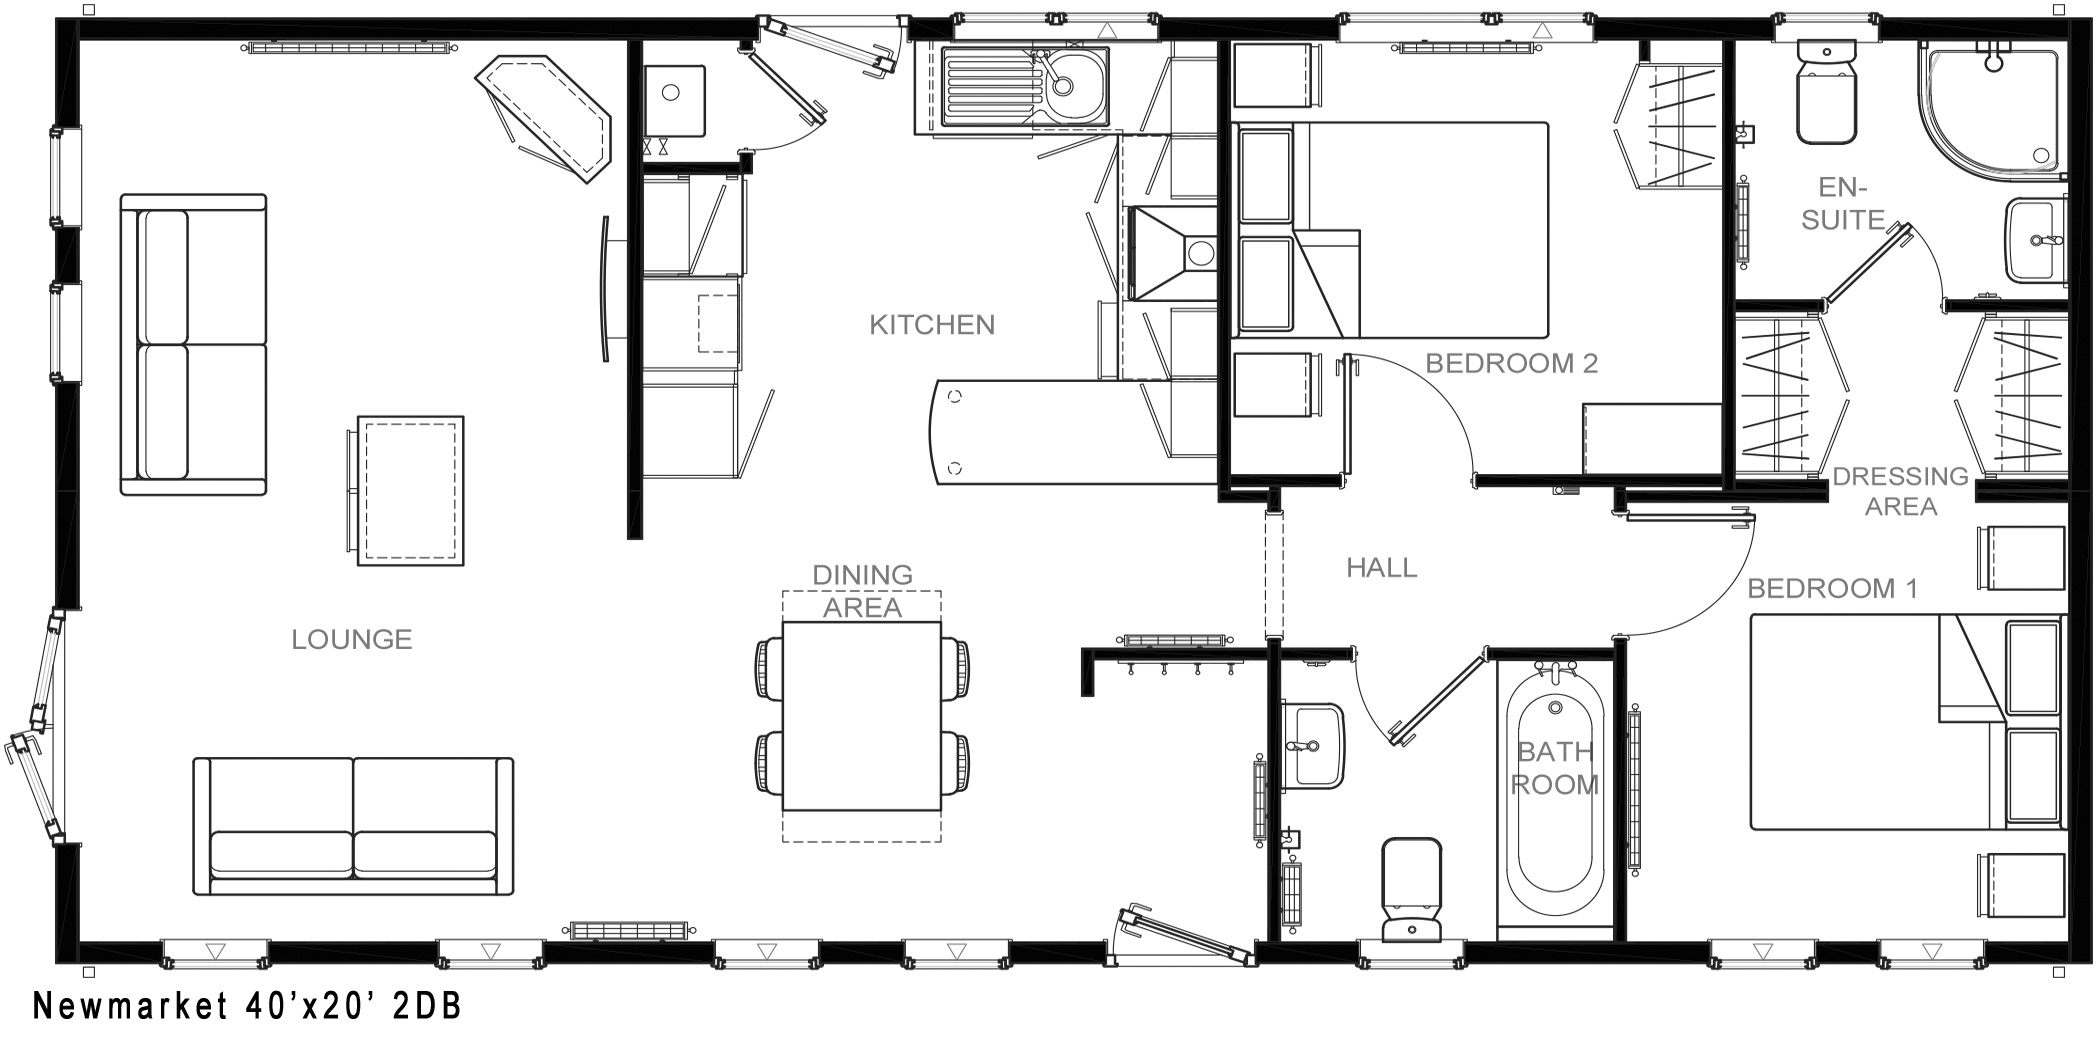 Plan 5403 Newmarket 40x20 2DB